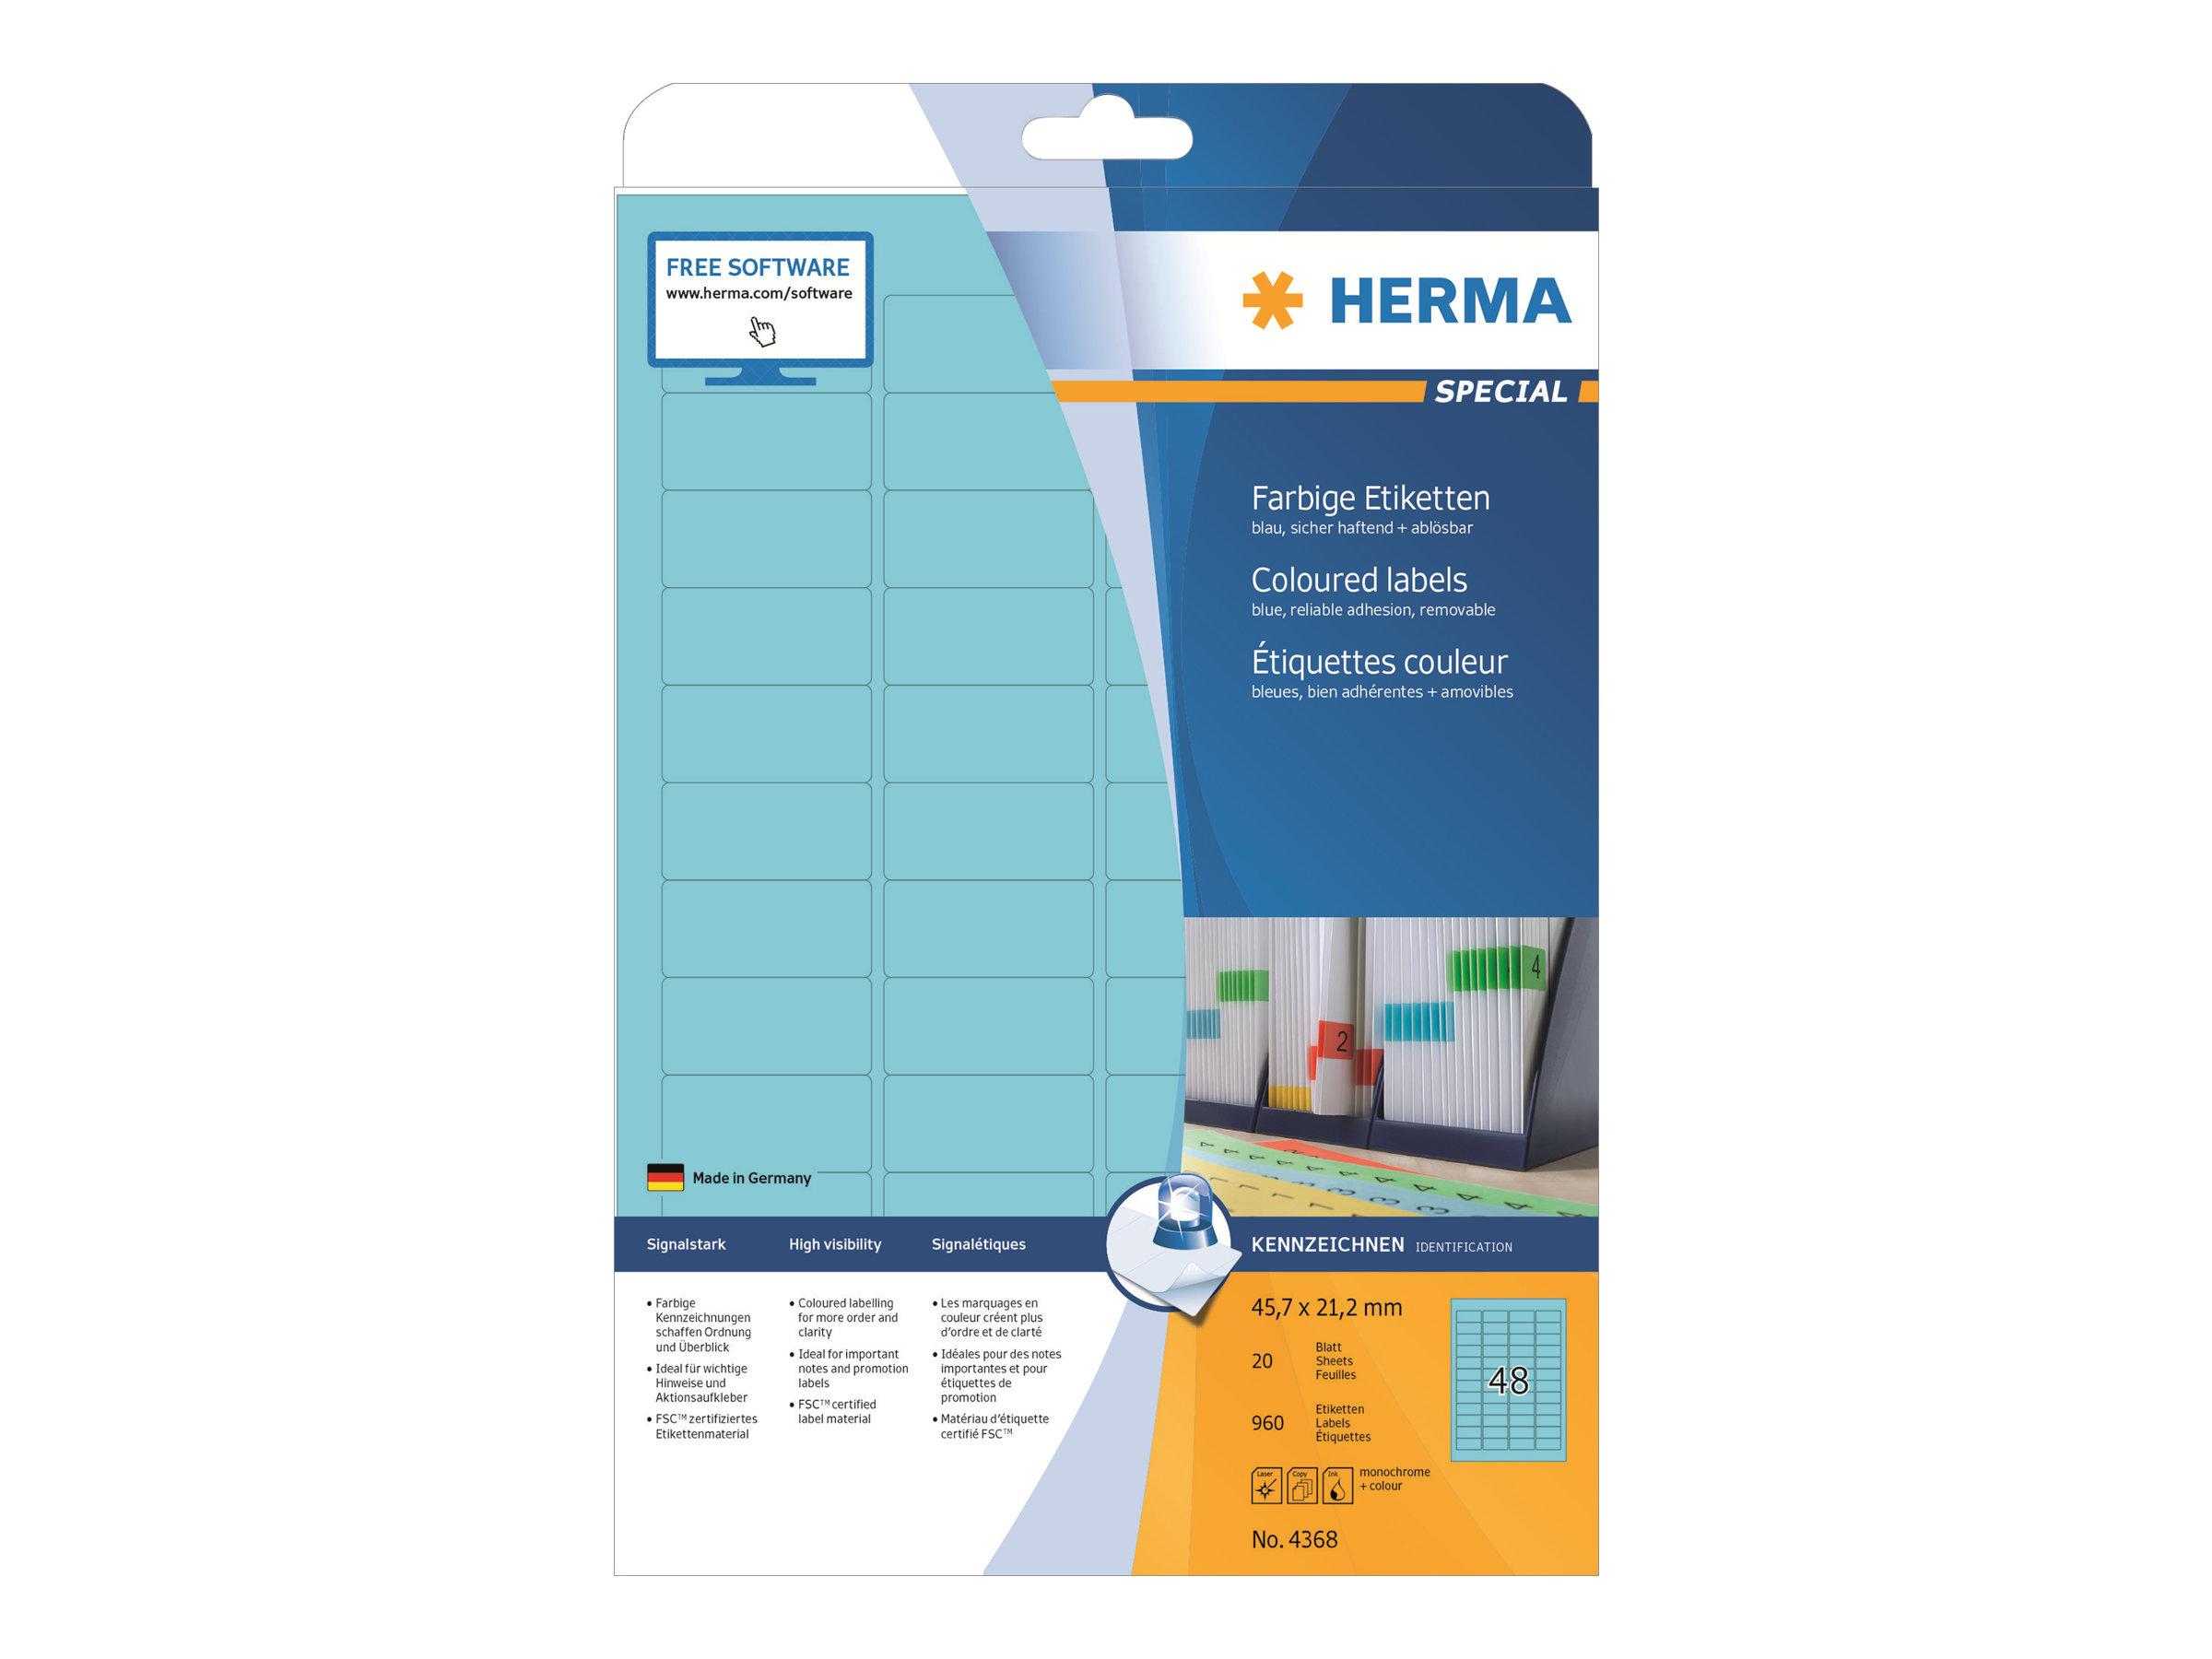 HERMA Special - Papier - matt - permanent selbstklebend - Blau - 45.7 x 21.2 mm 960 Etikett(en) (20 Bogen x 48)